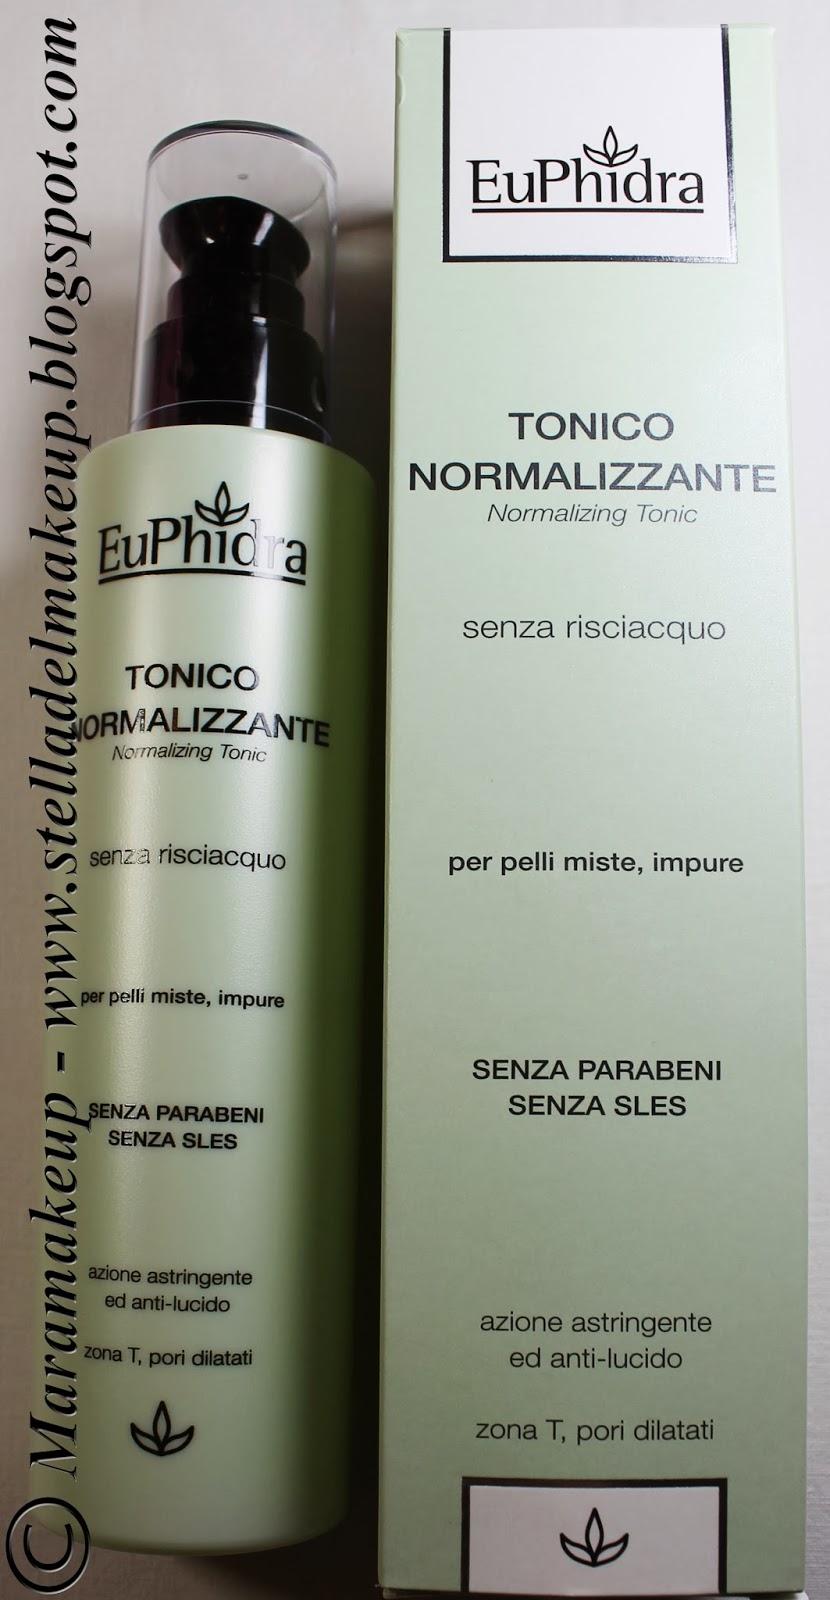 tonico euphidra